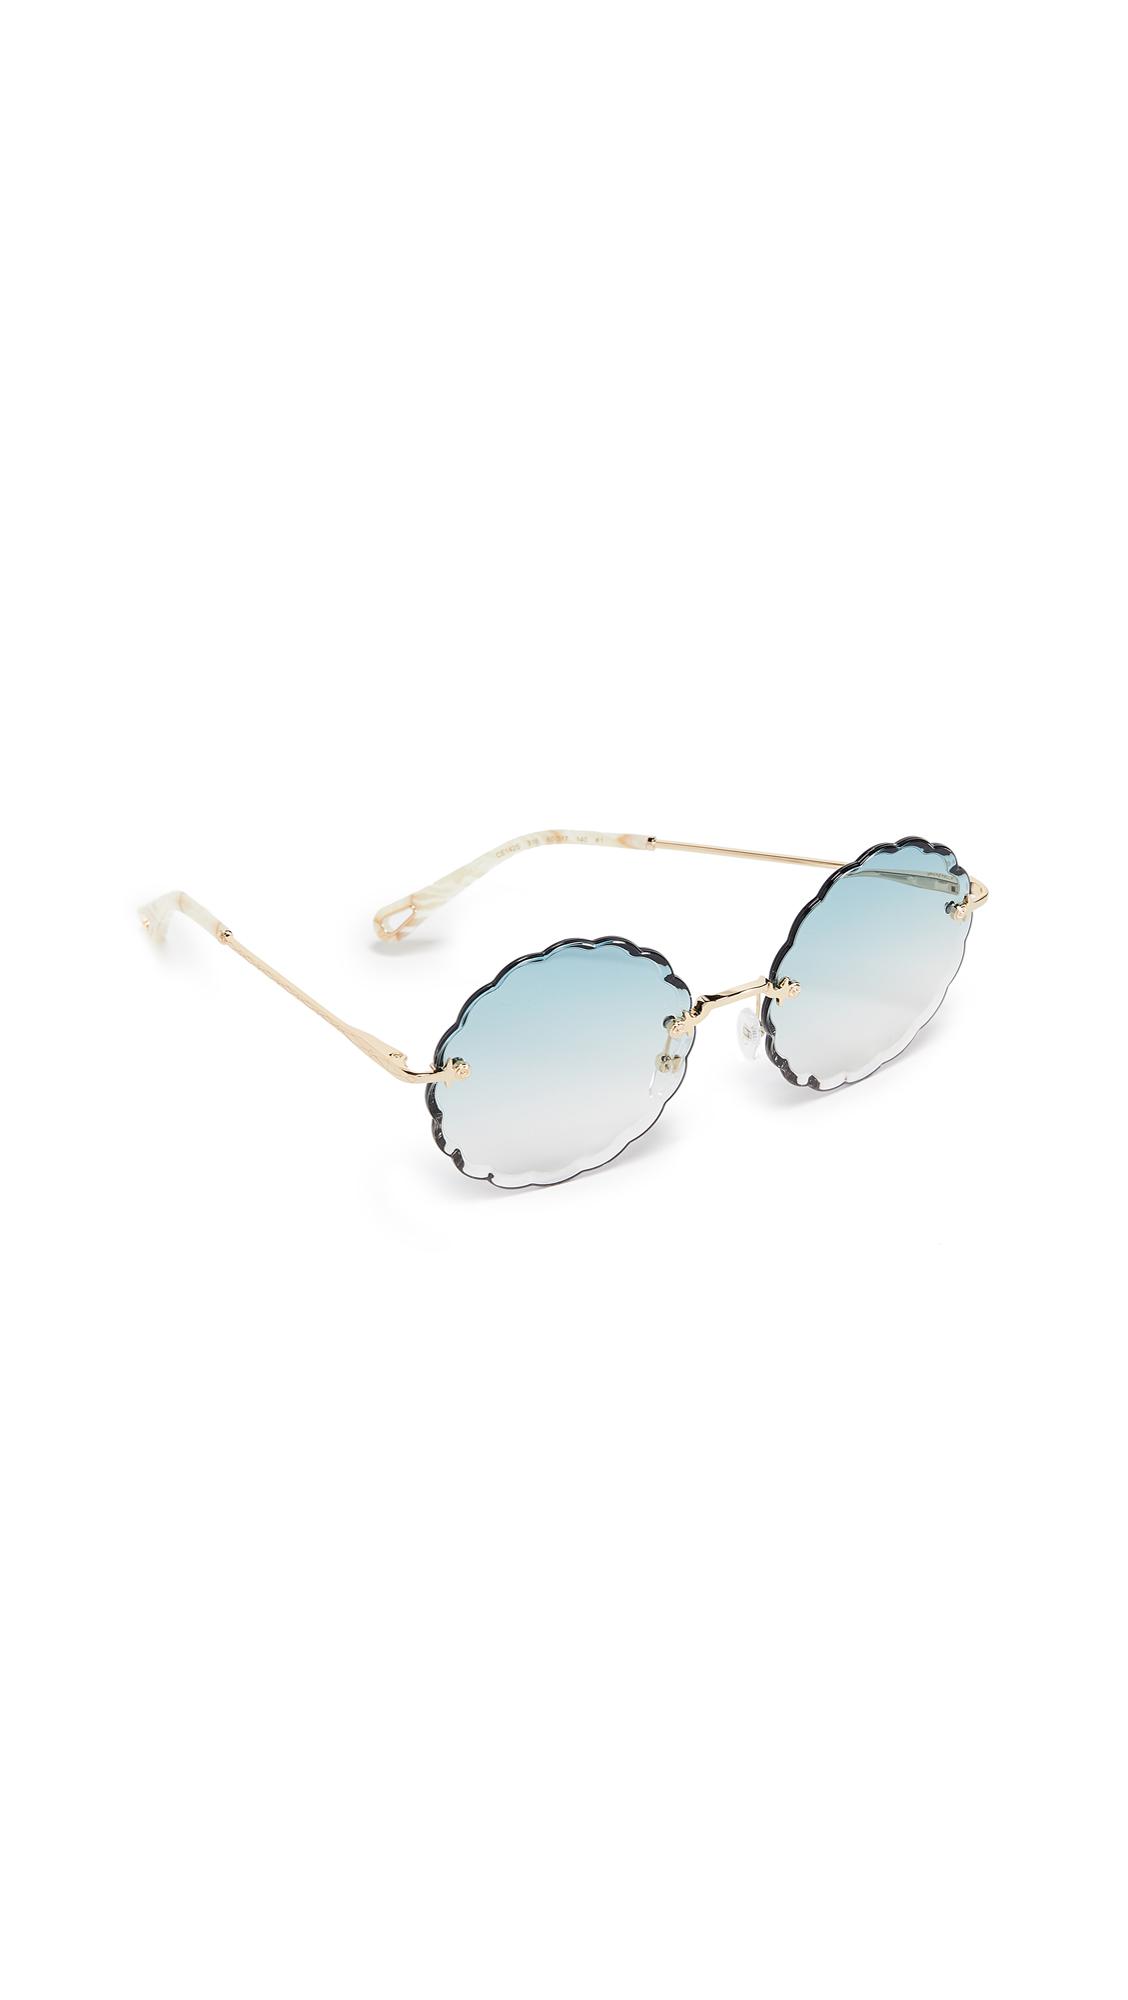 ccb8ba092852 ChloÉ Women s Rose Scalloped Rimless Round Sunglasses